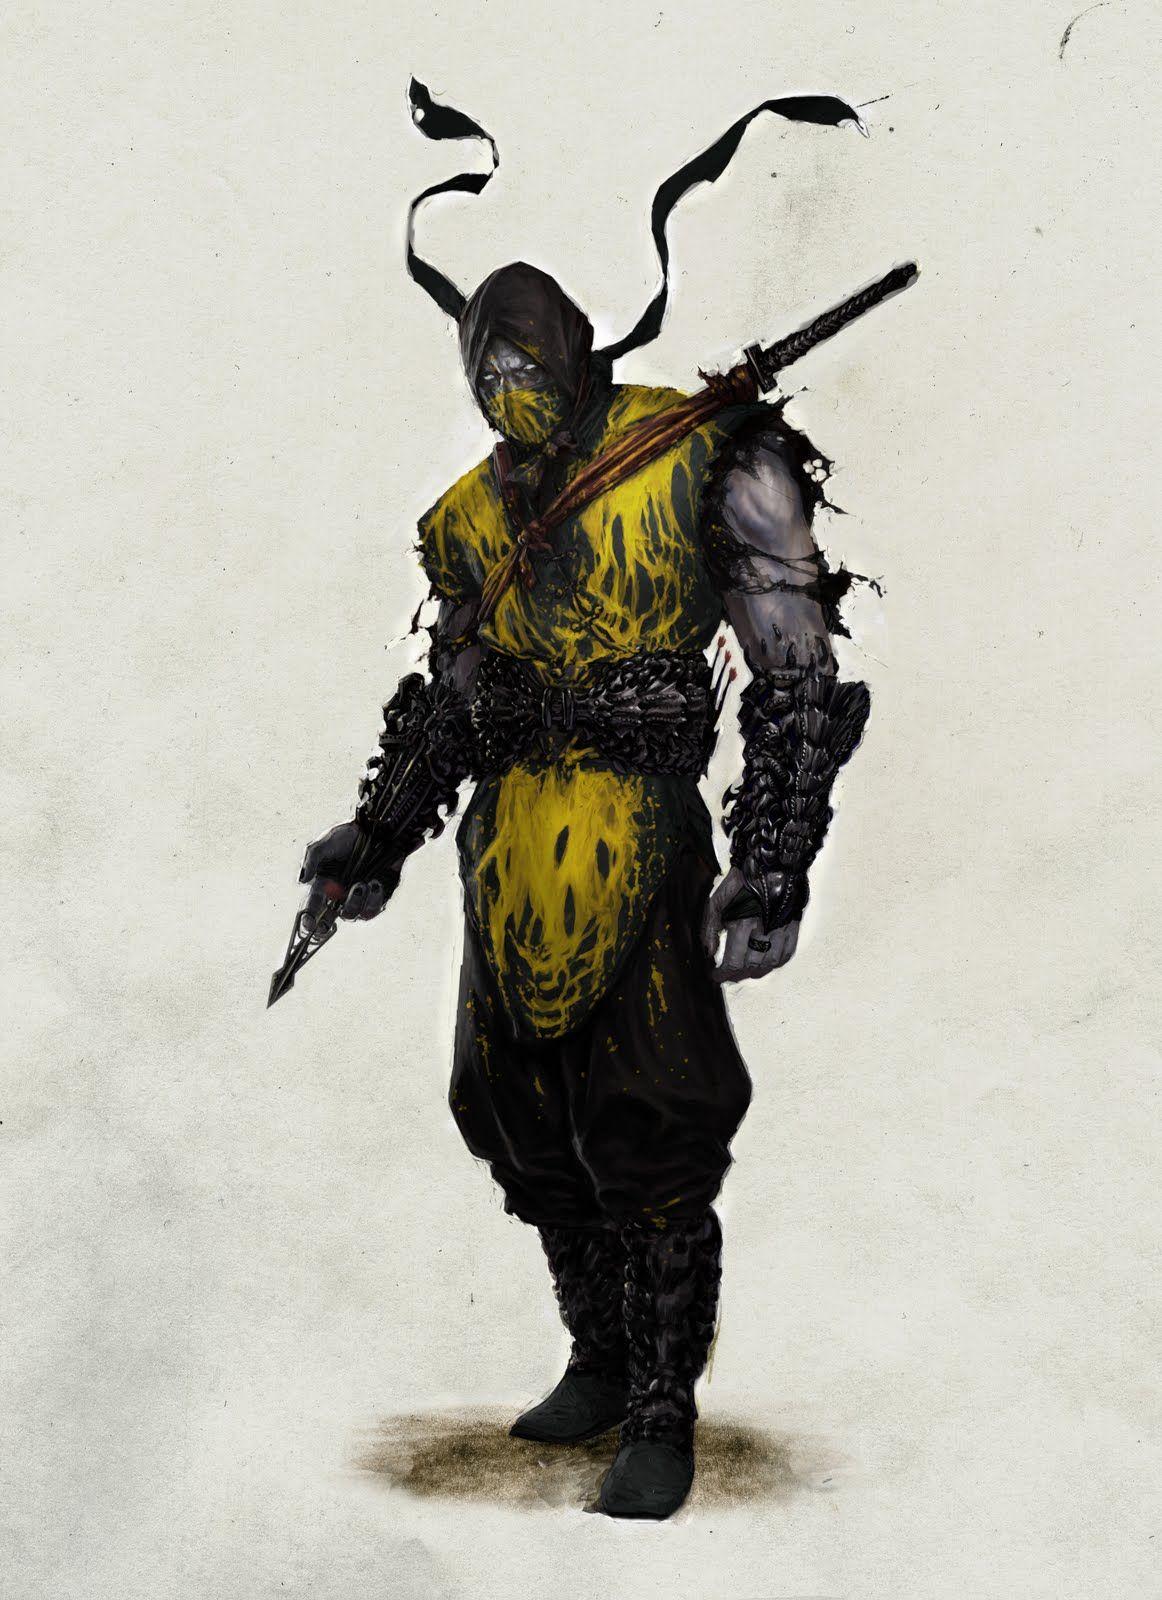 Vincent Proce Art Blog Scorpion Mortal Kombat Mortal Kombat Art